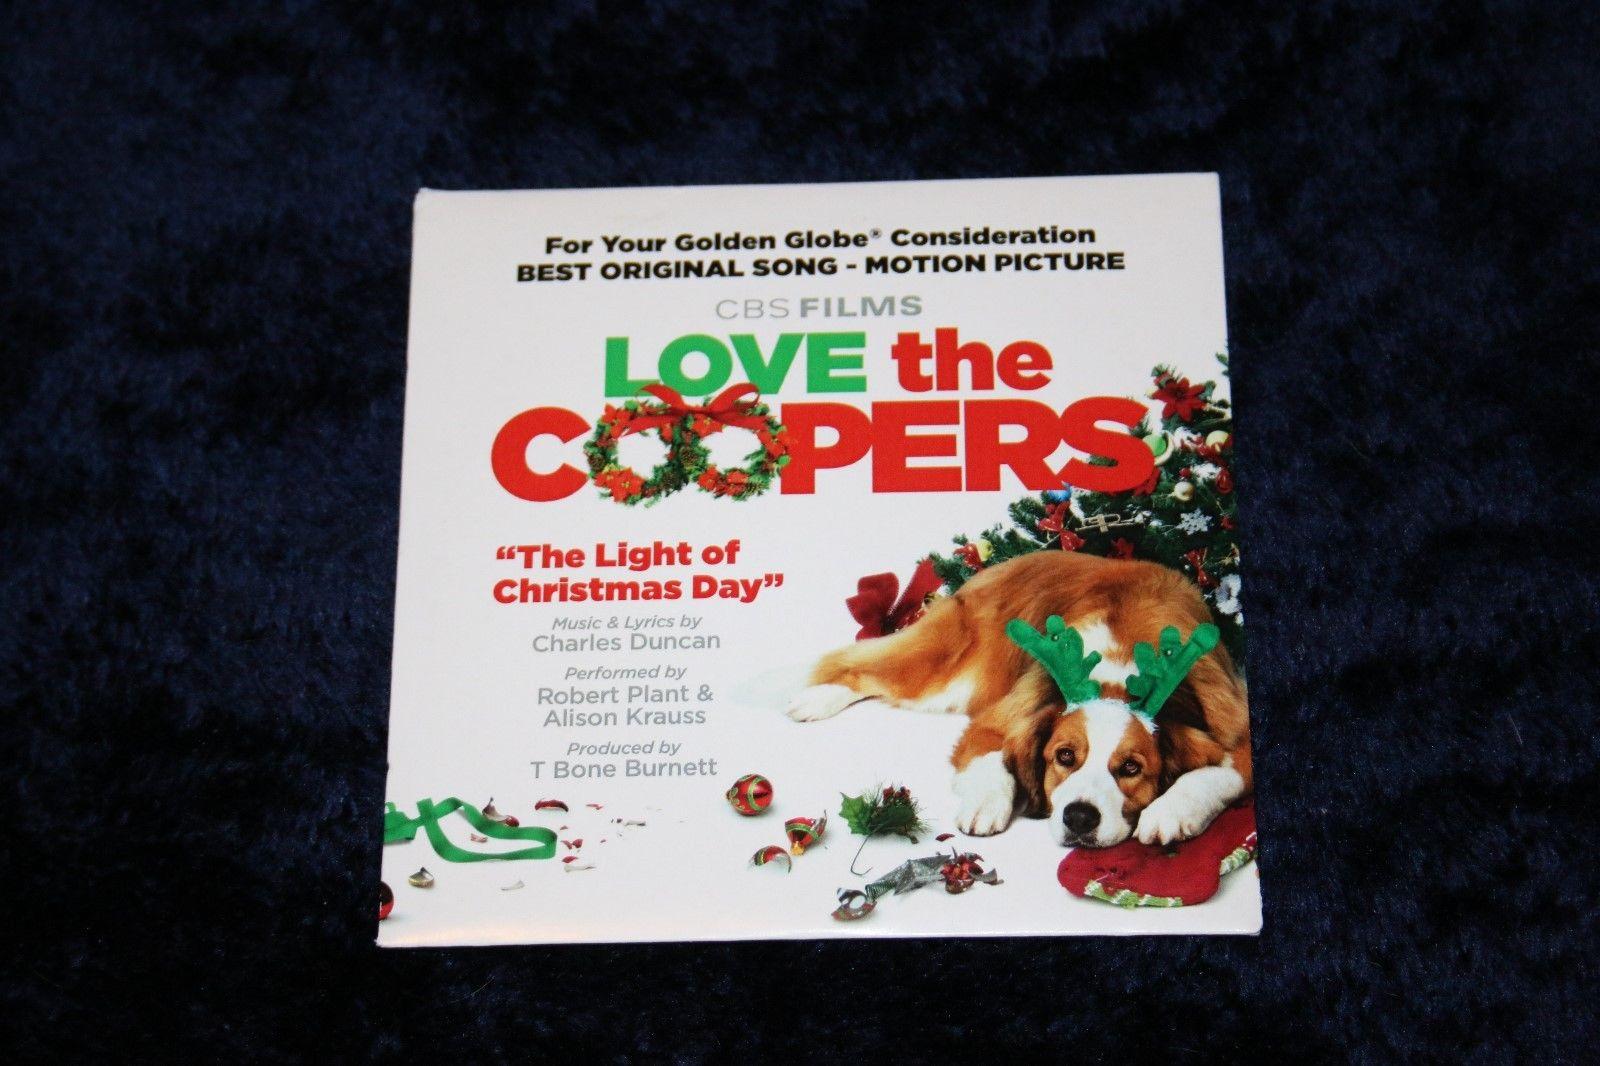 Light Of Christmas Lyrics.Allison Krauss Robert Plant Light Of Christmas Day